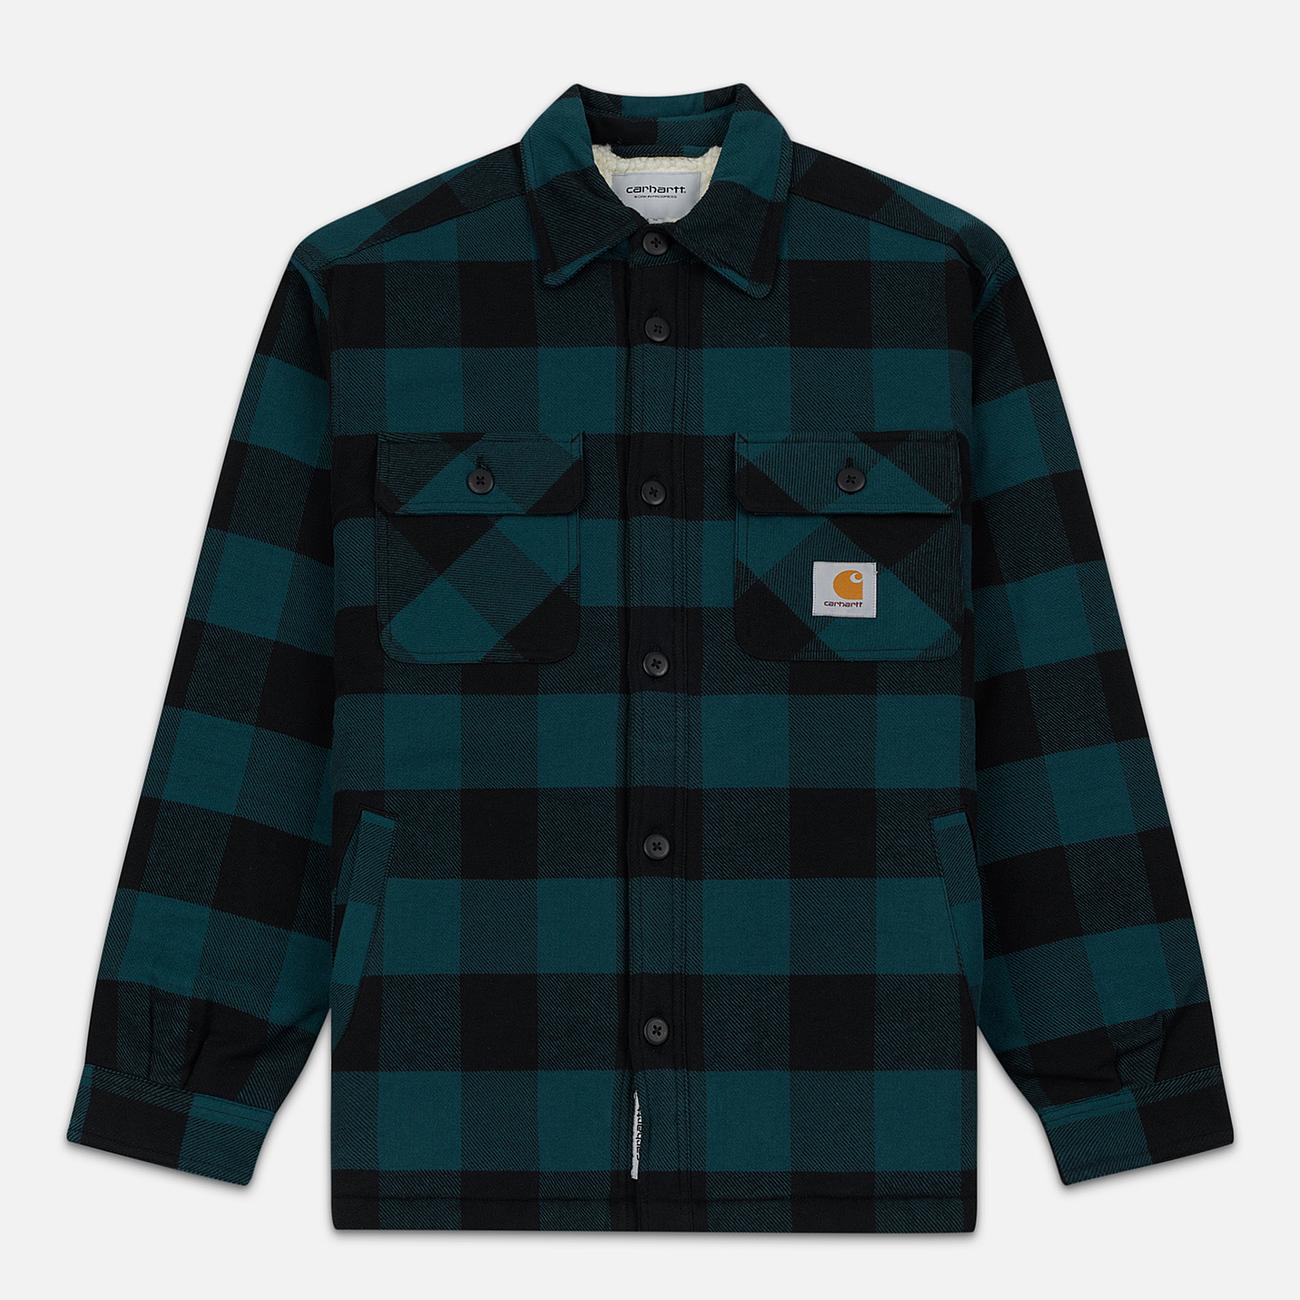 Мужская куртка Carhartt WIP Merton Check Dark Fir